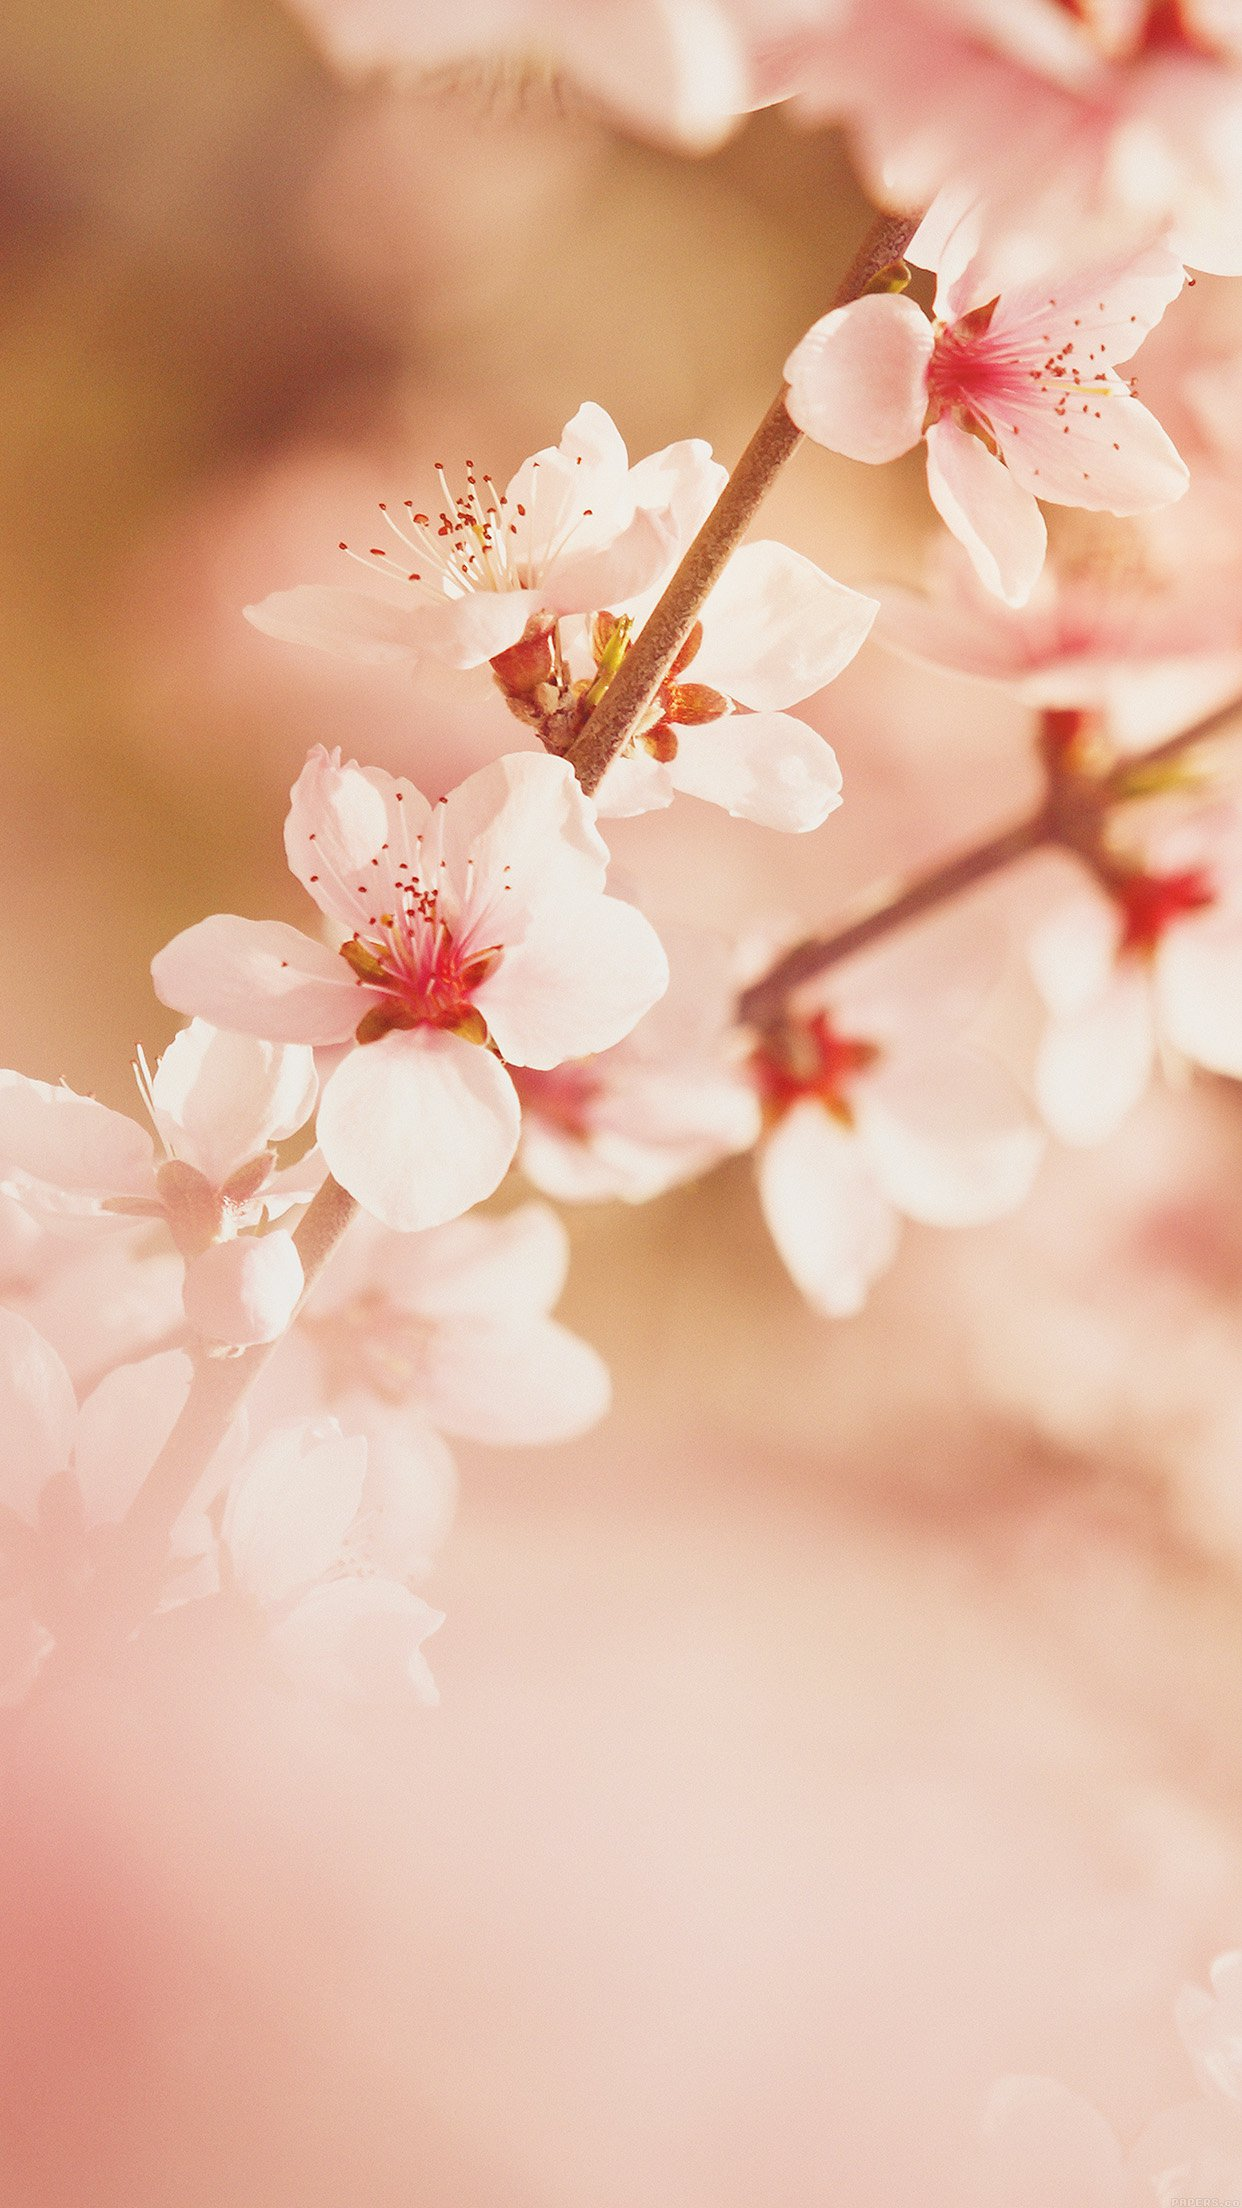 Spring Flower Sullysully Cherry Blossom Nature Android Wallpaper